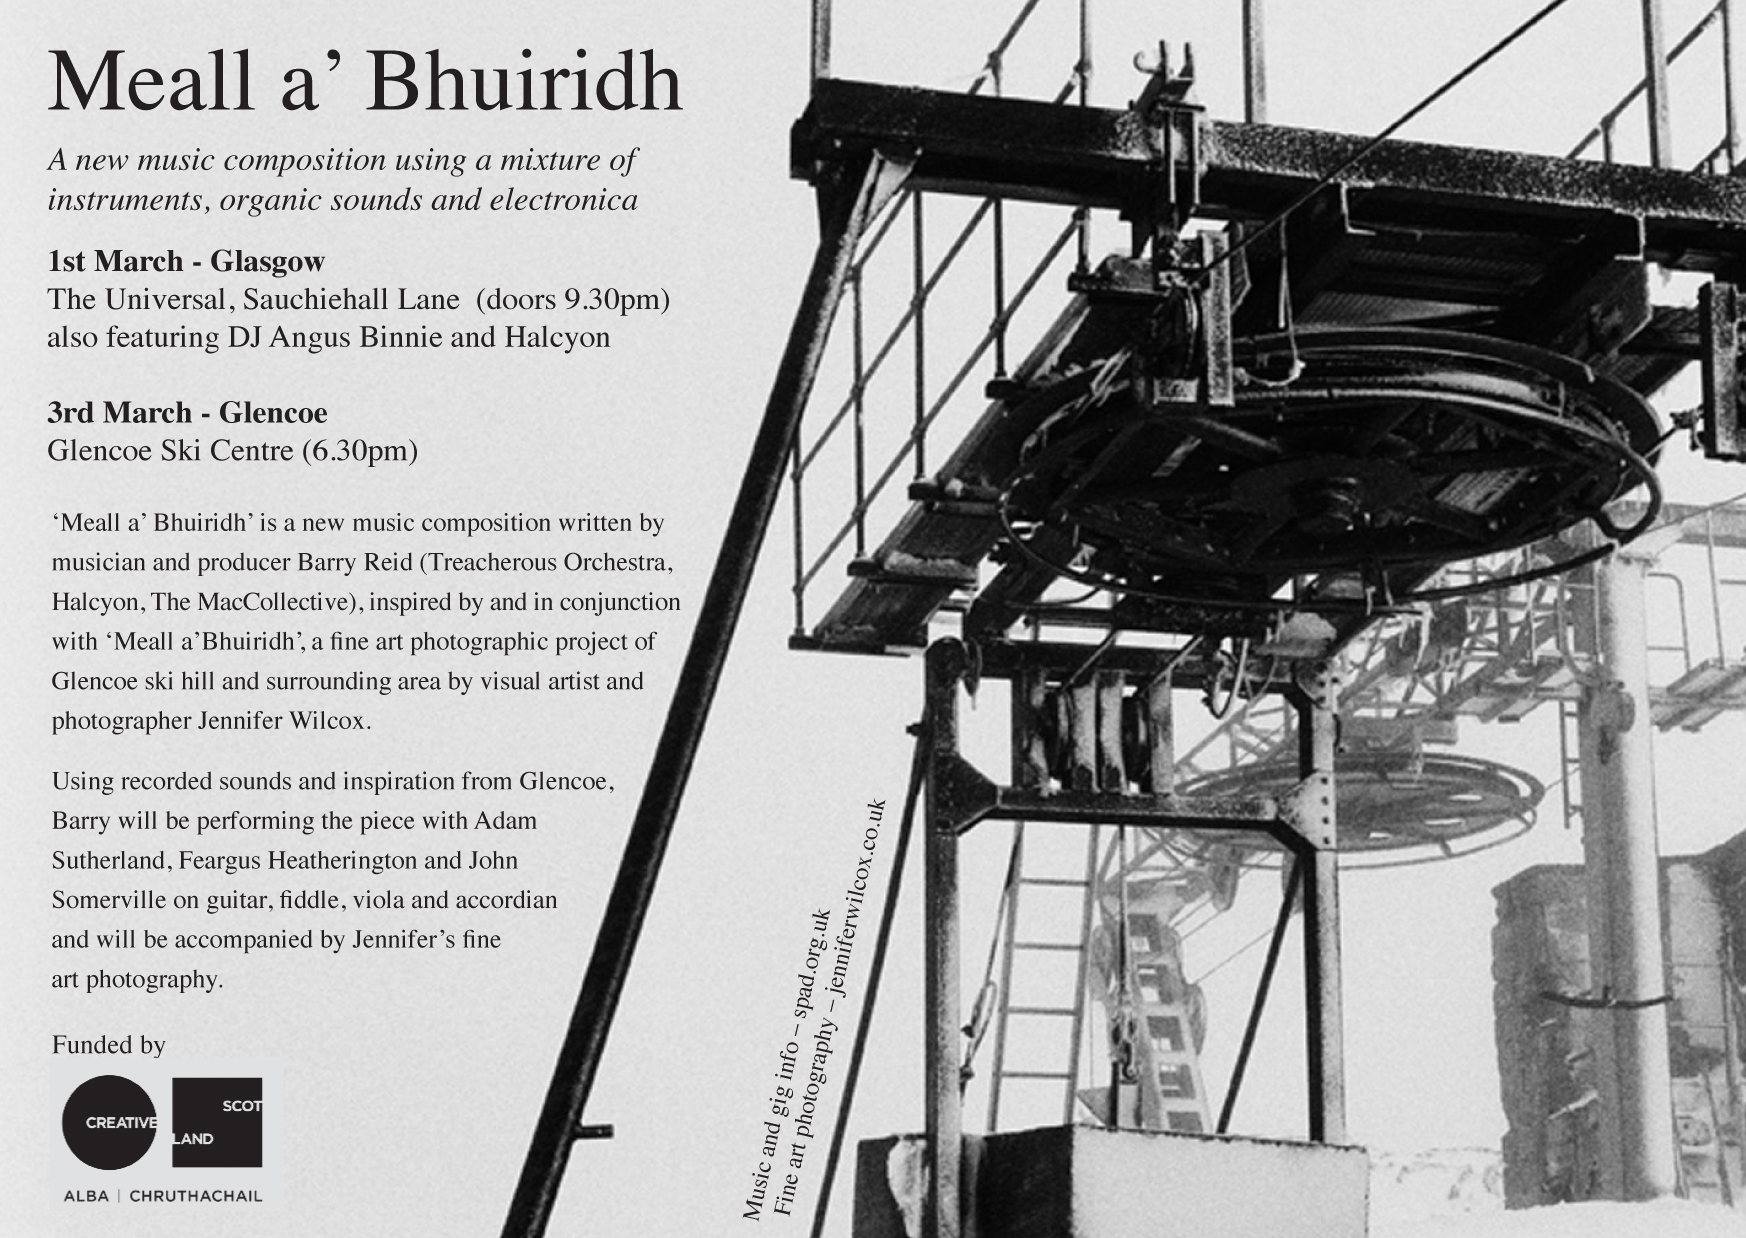 Meall a' Bhuiridh Flyer